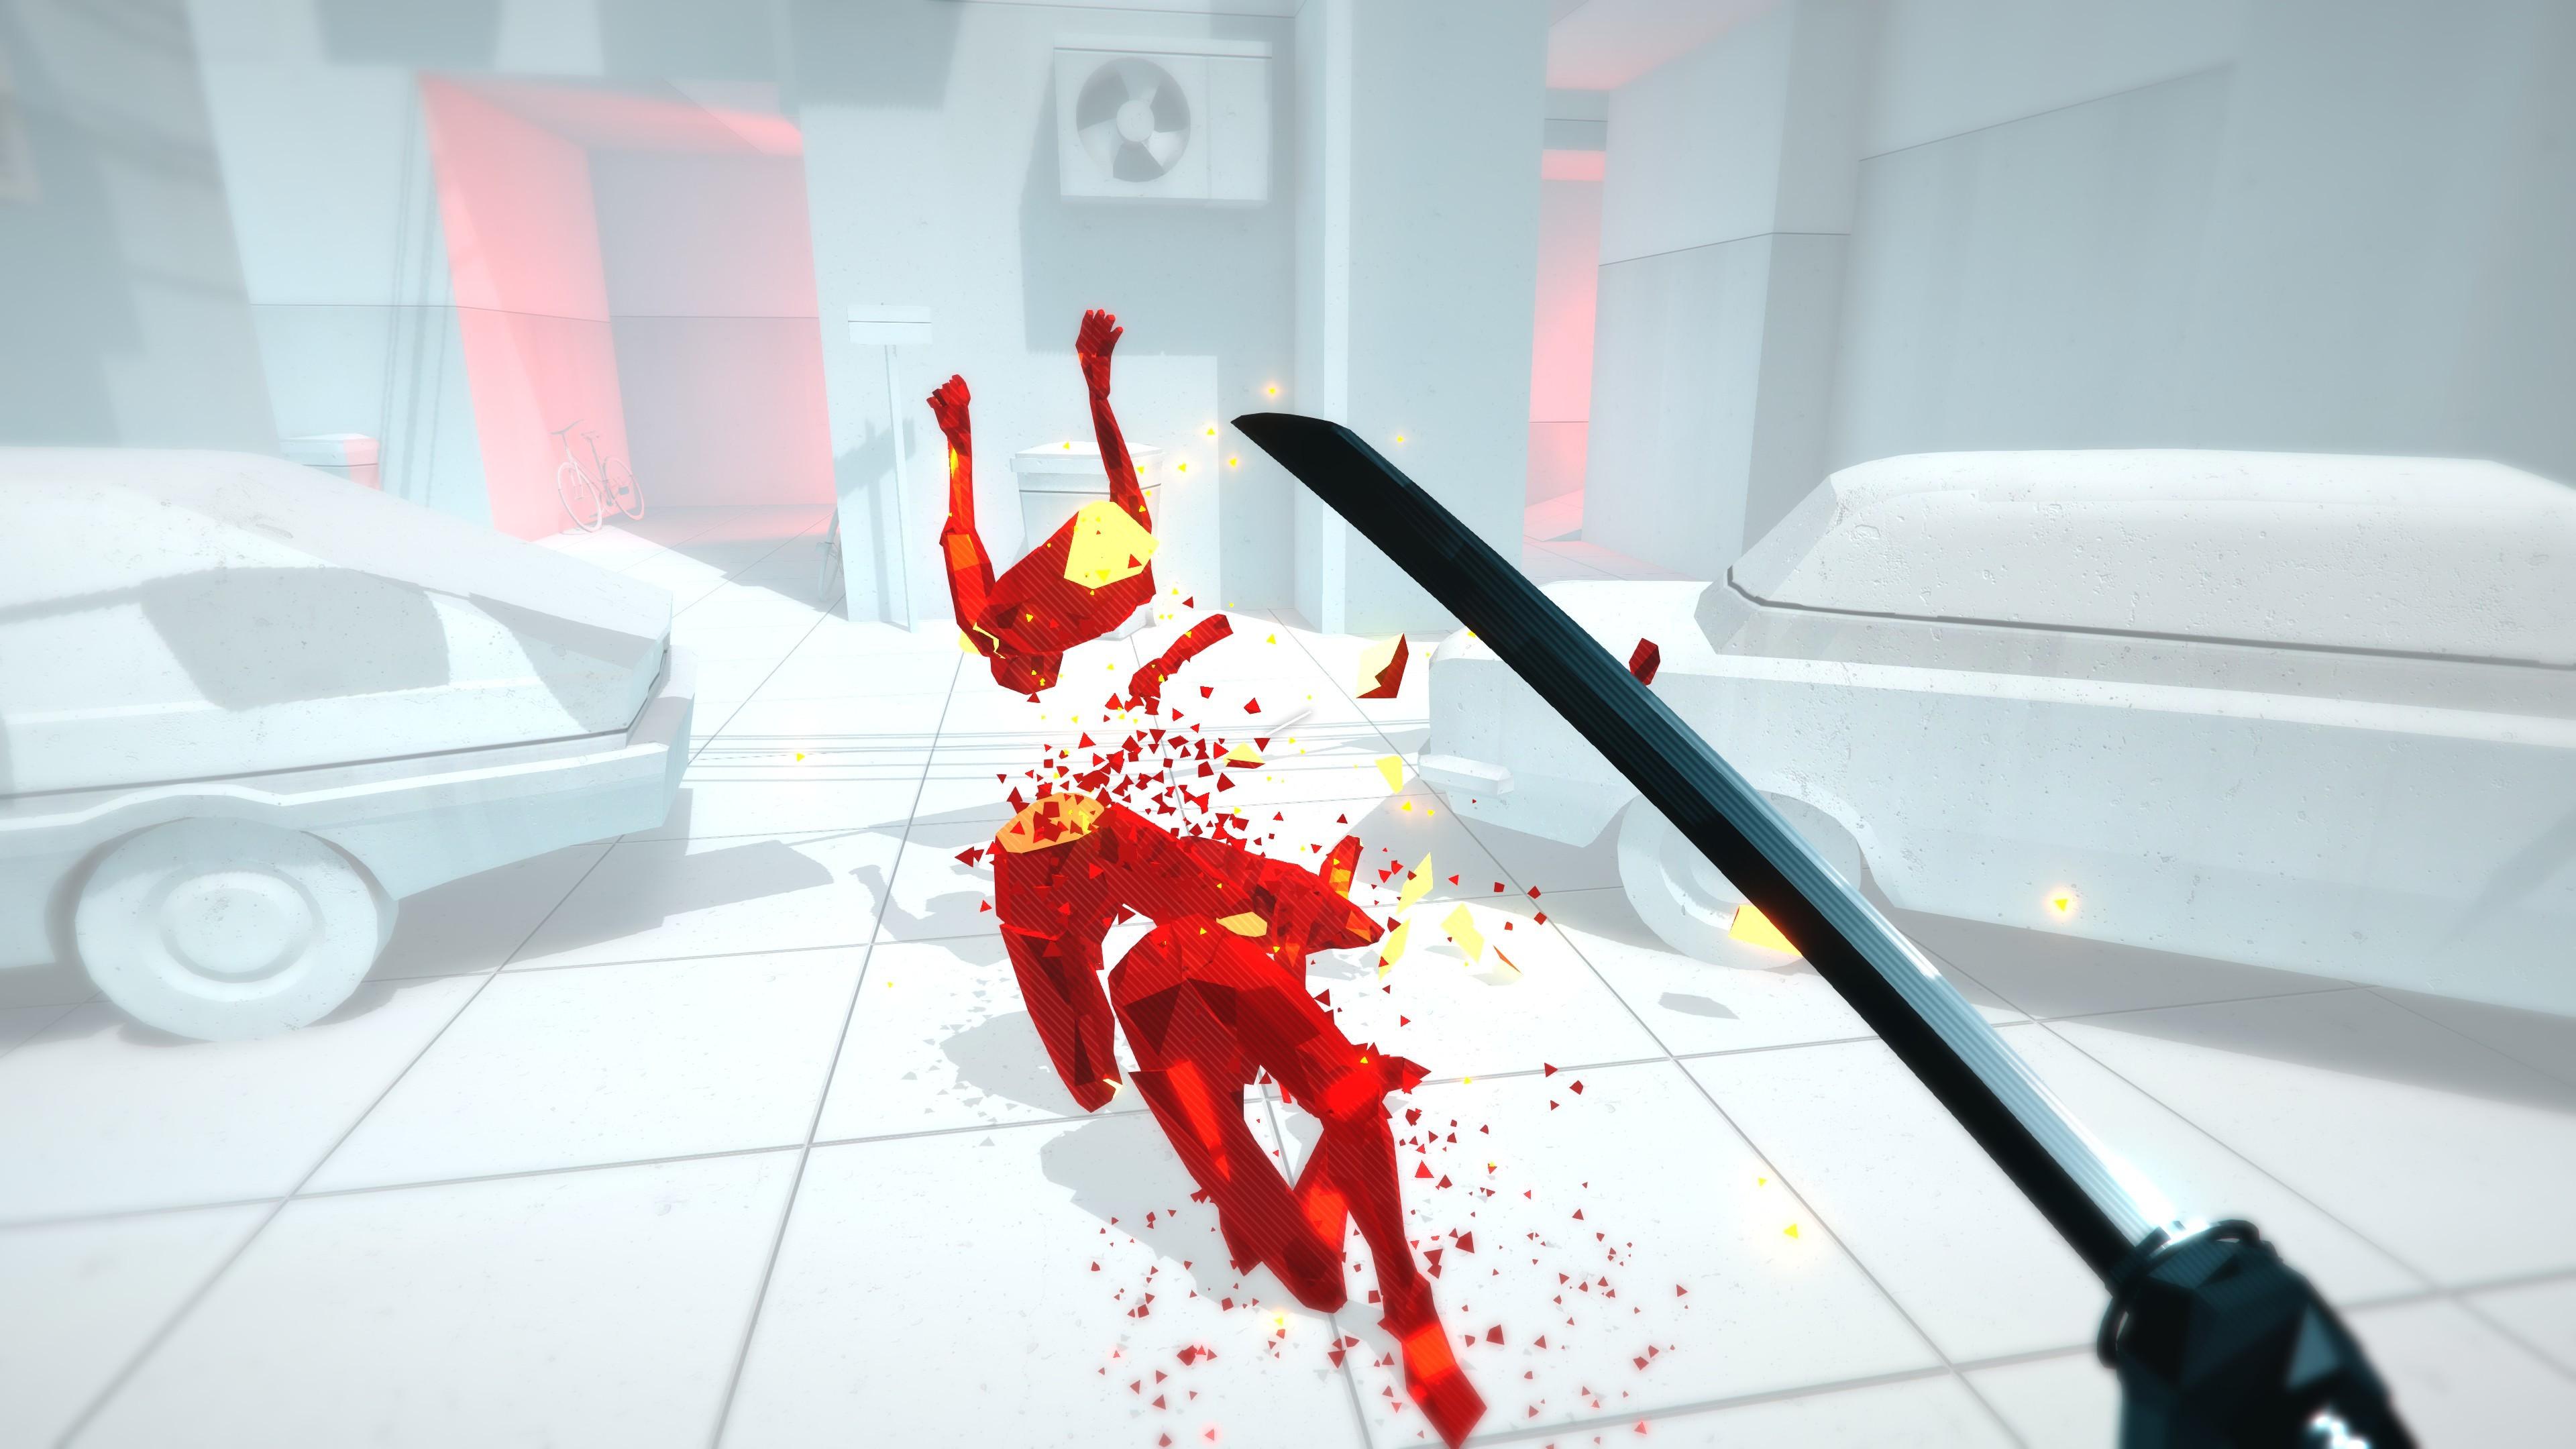 Xbox One X 4k Magic: Superhot Wallpaper, Games / Action: Superhot, Shooter